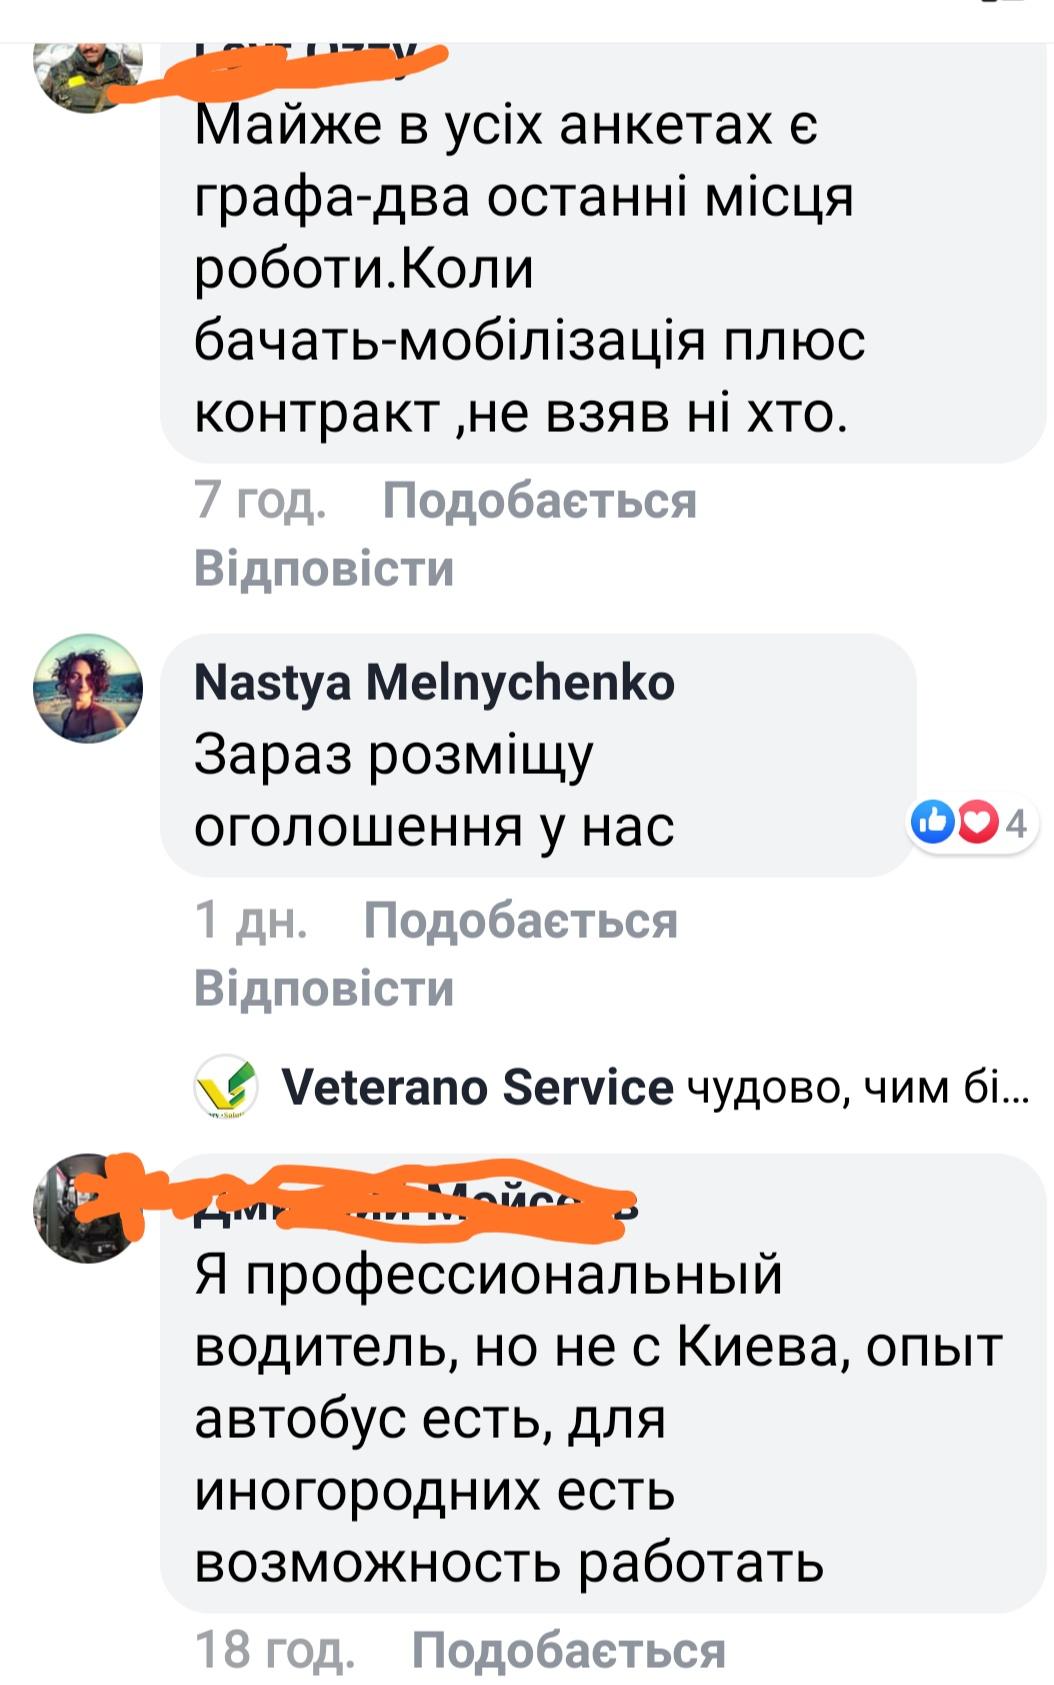 Працевлаштування АТОвців – справа не проста - Україна, КОДА, київщина - 0827 Veter2